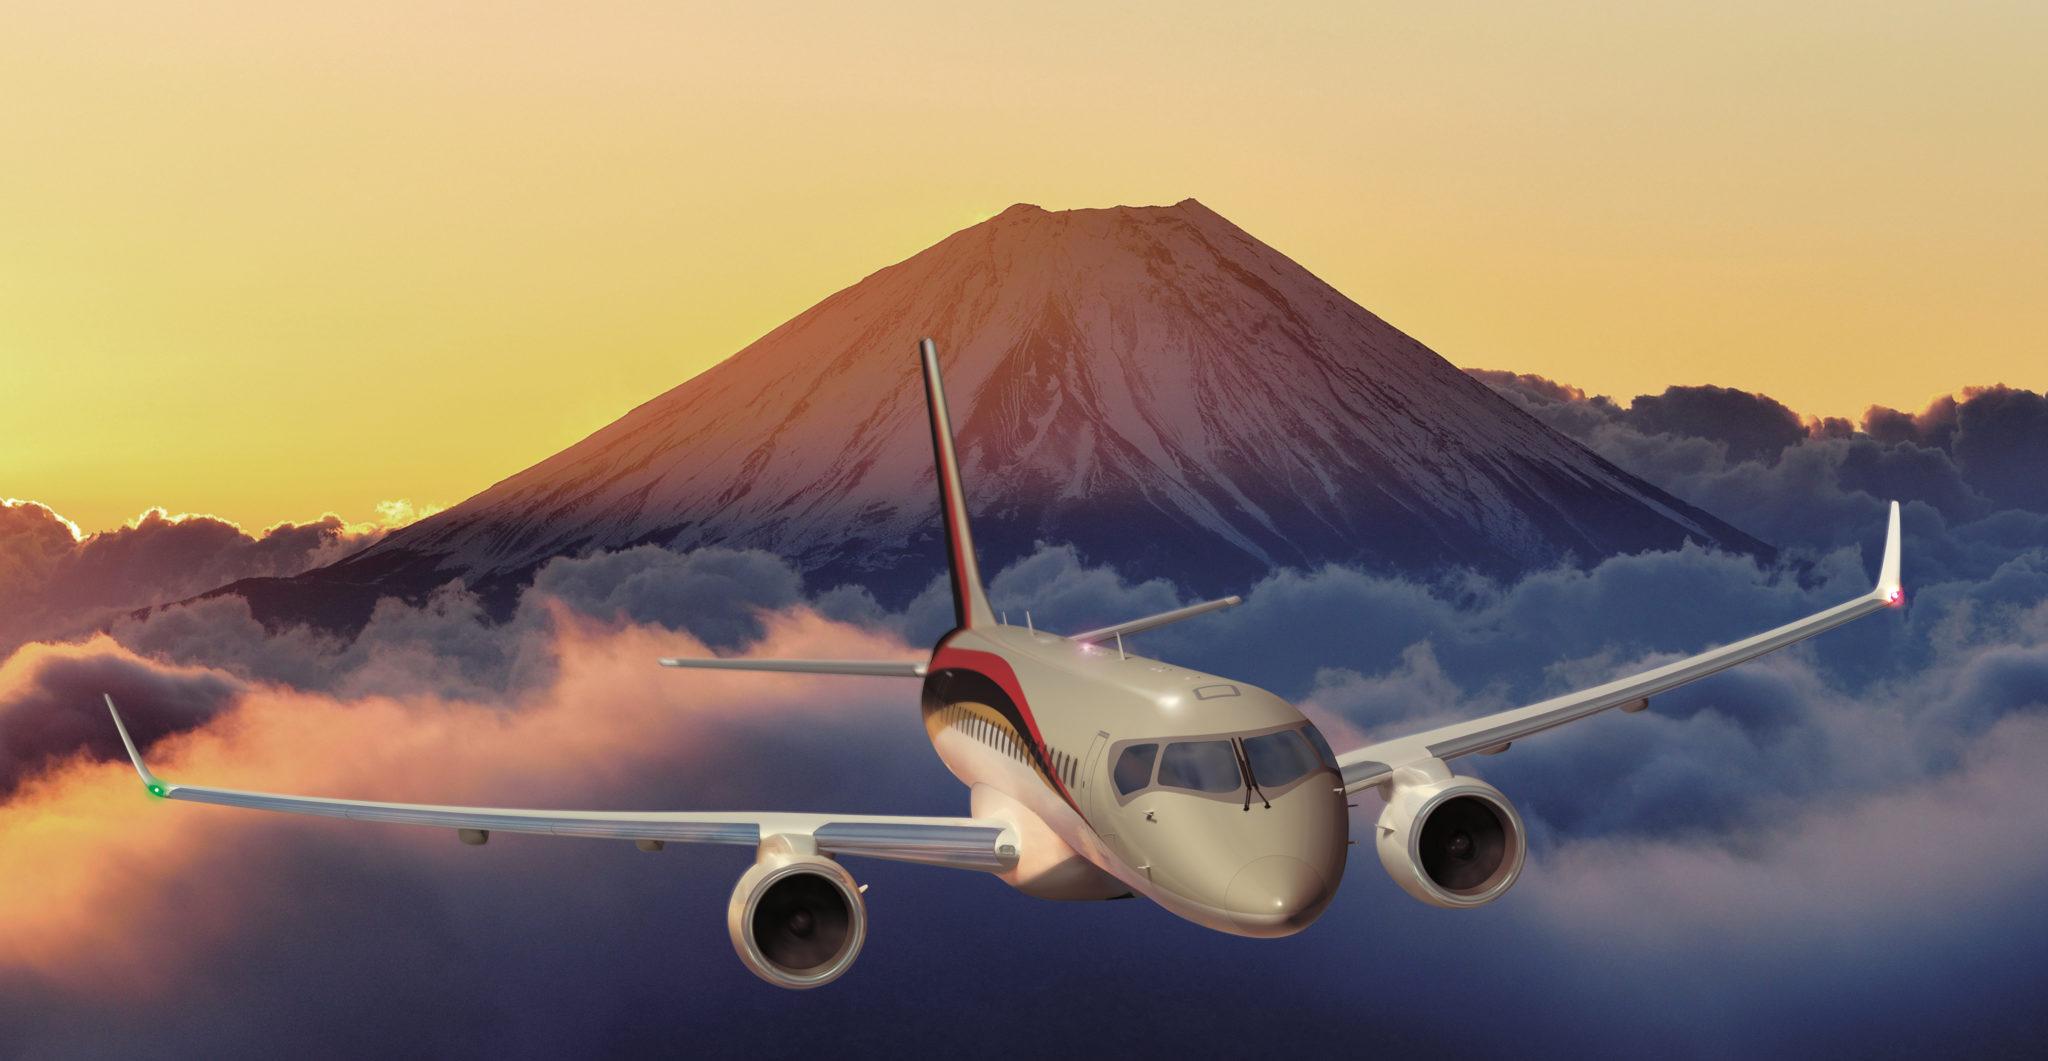 mitsubishi talks mrj sales as new day dawns for japanese aviation - runway  girlrunway girl